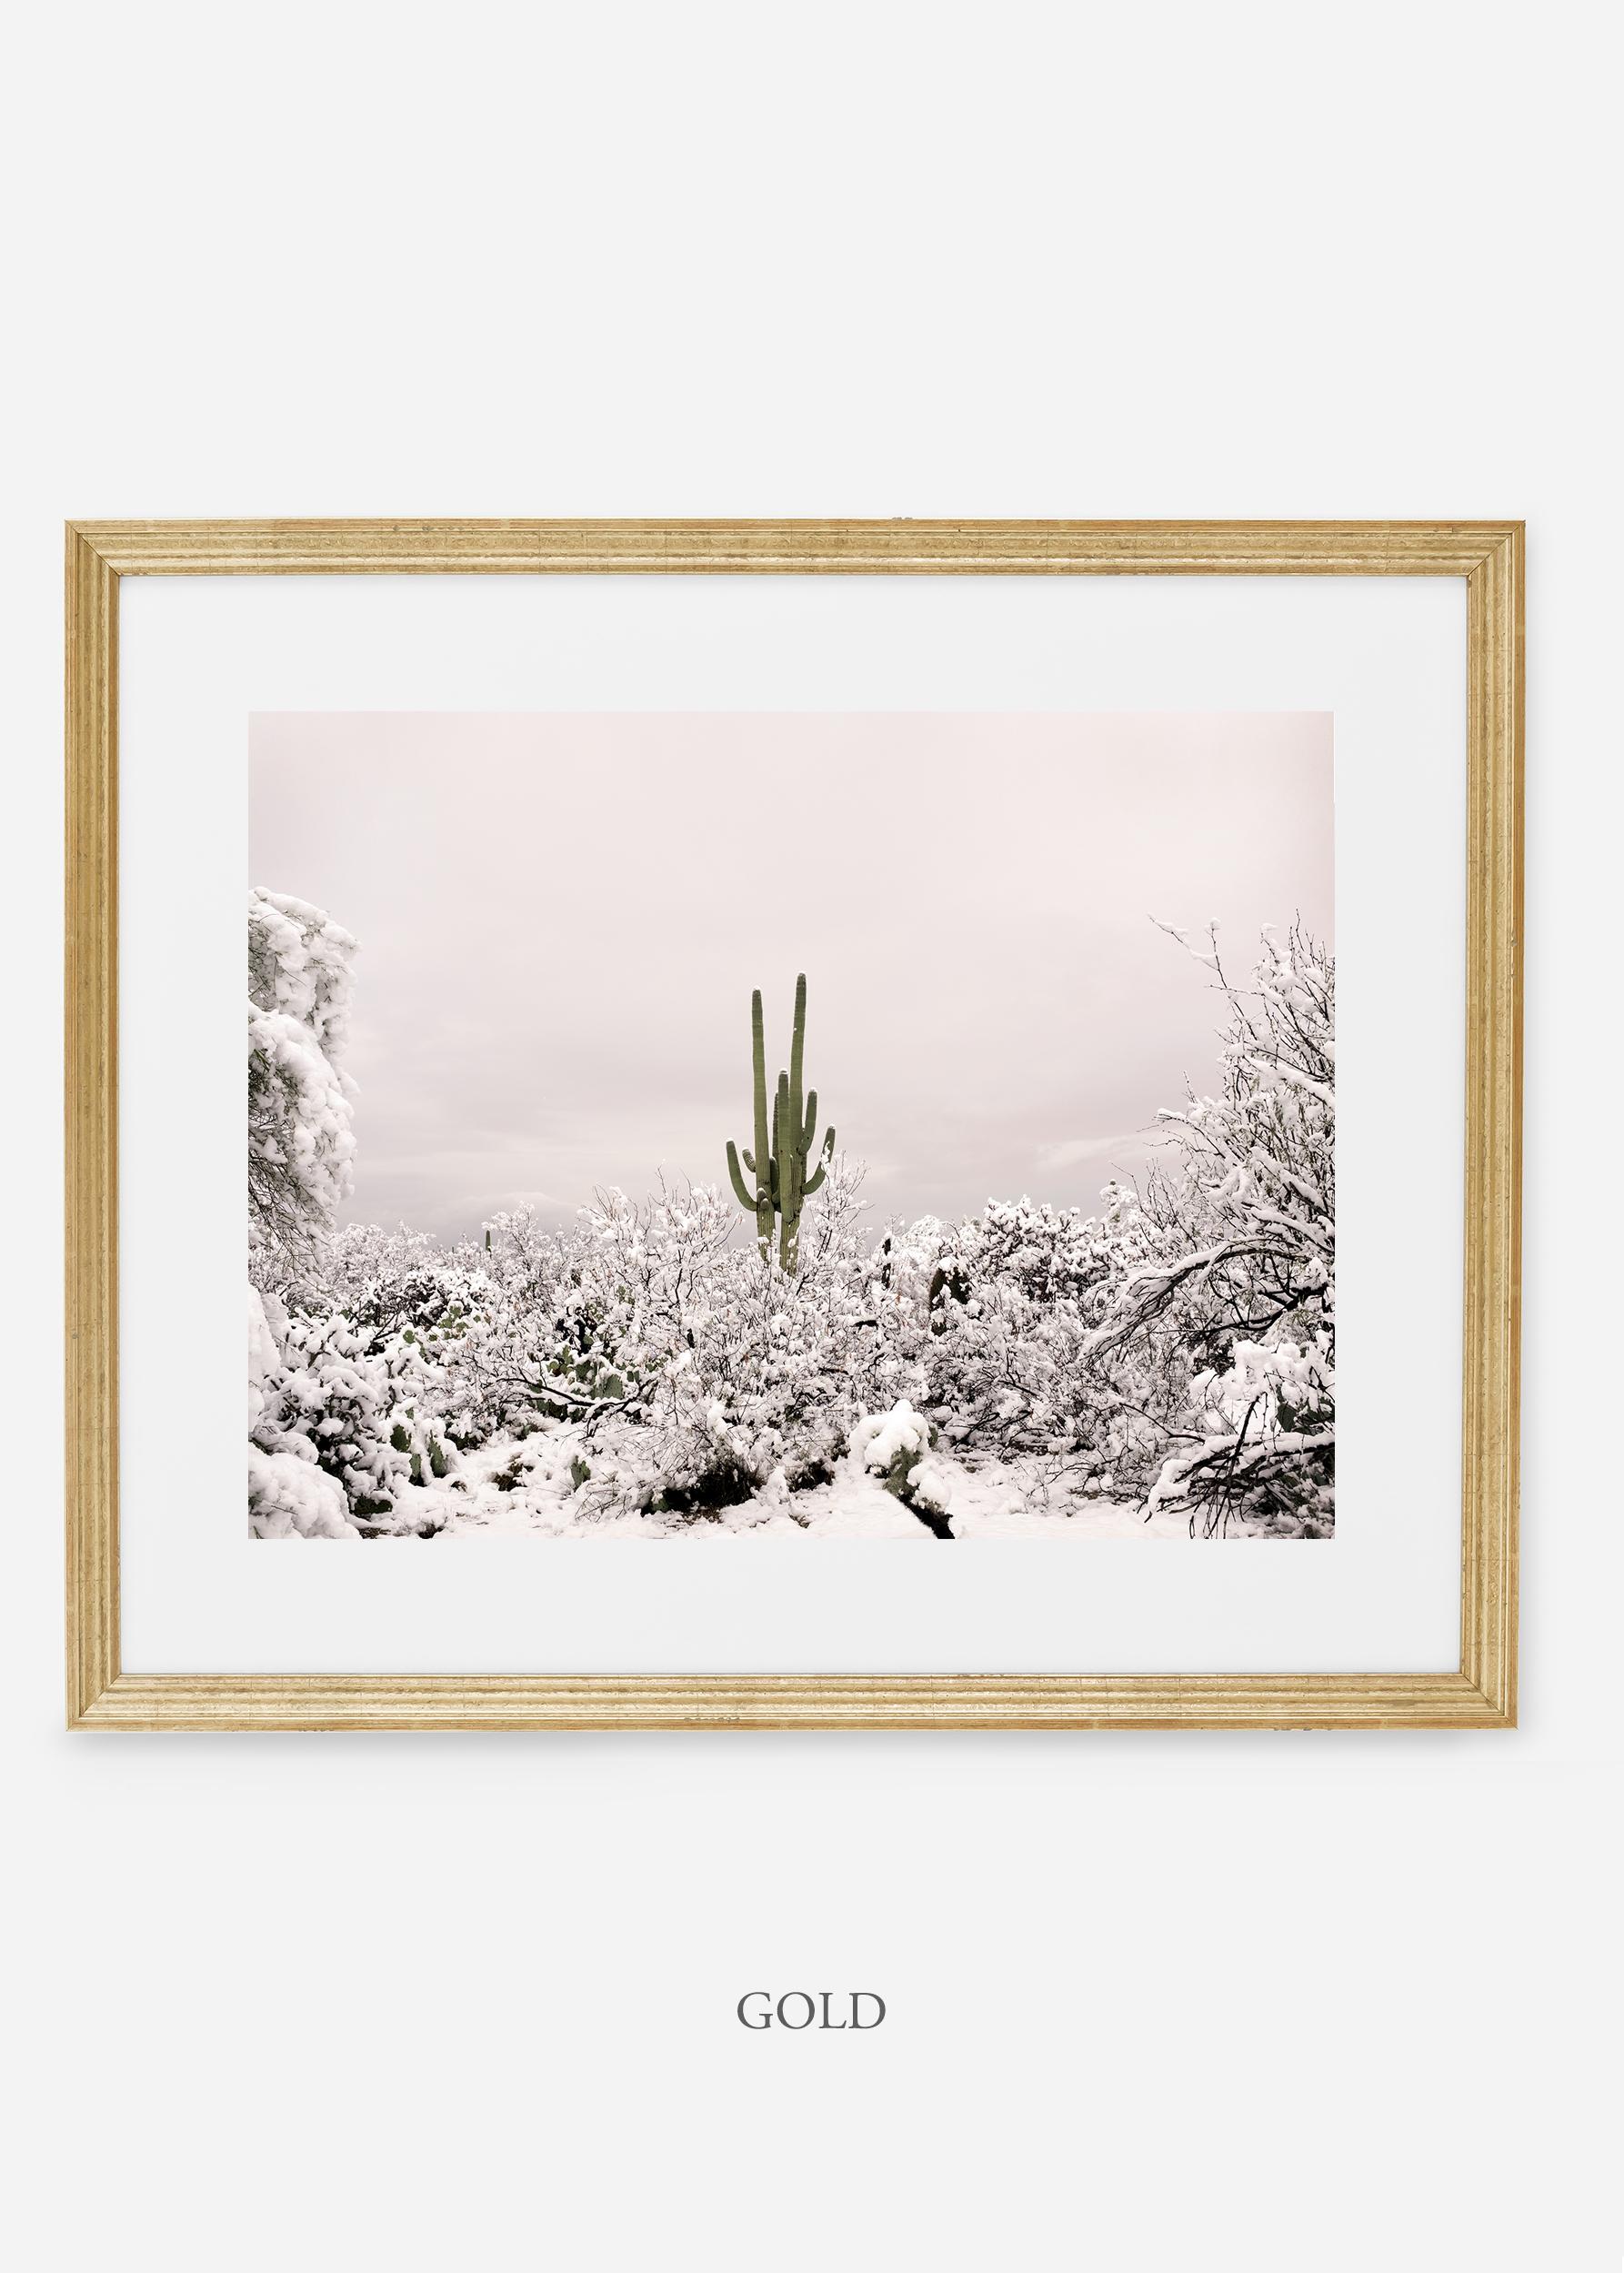 goldframe-saguaroNo.1-wildercalifornia-art-wallart-cactusprint-homedecor-prints-arizona-botanical-artwork-interiordesign.jpg